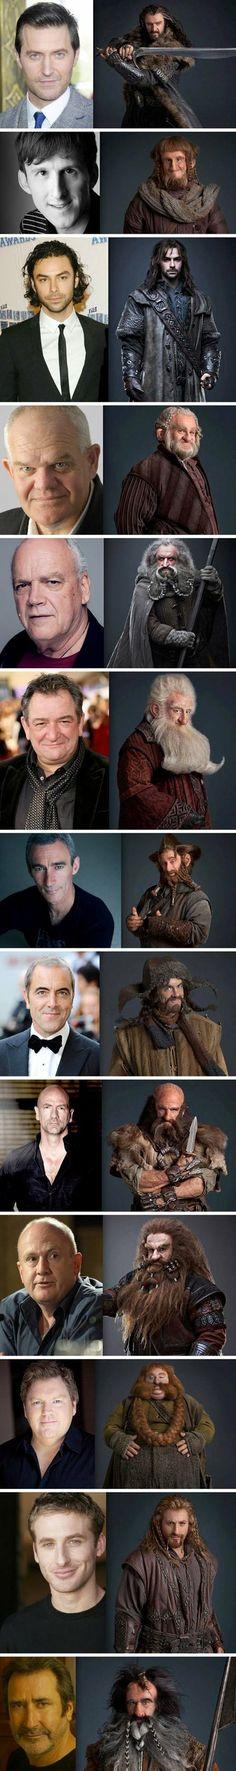 The Hobbit dwarves – pre and post make-up